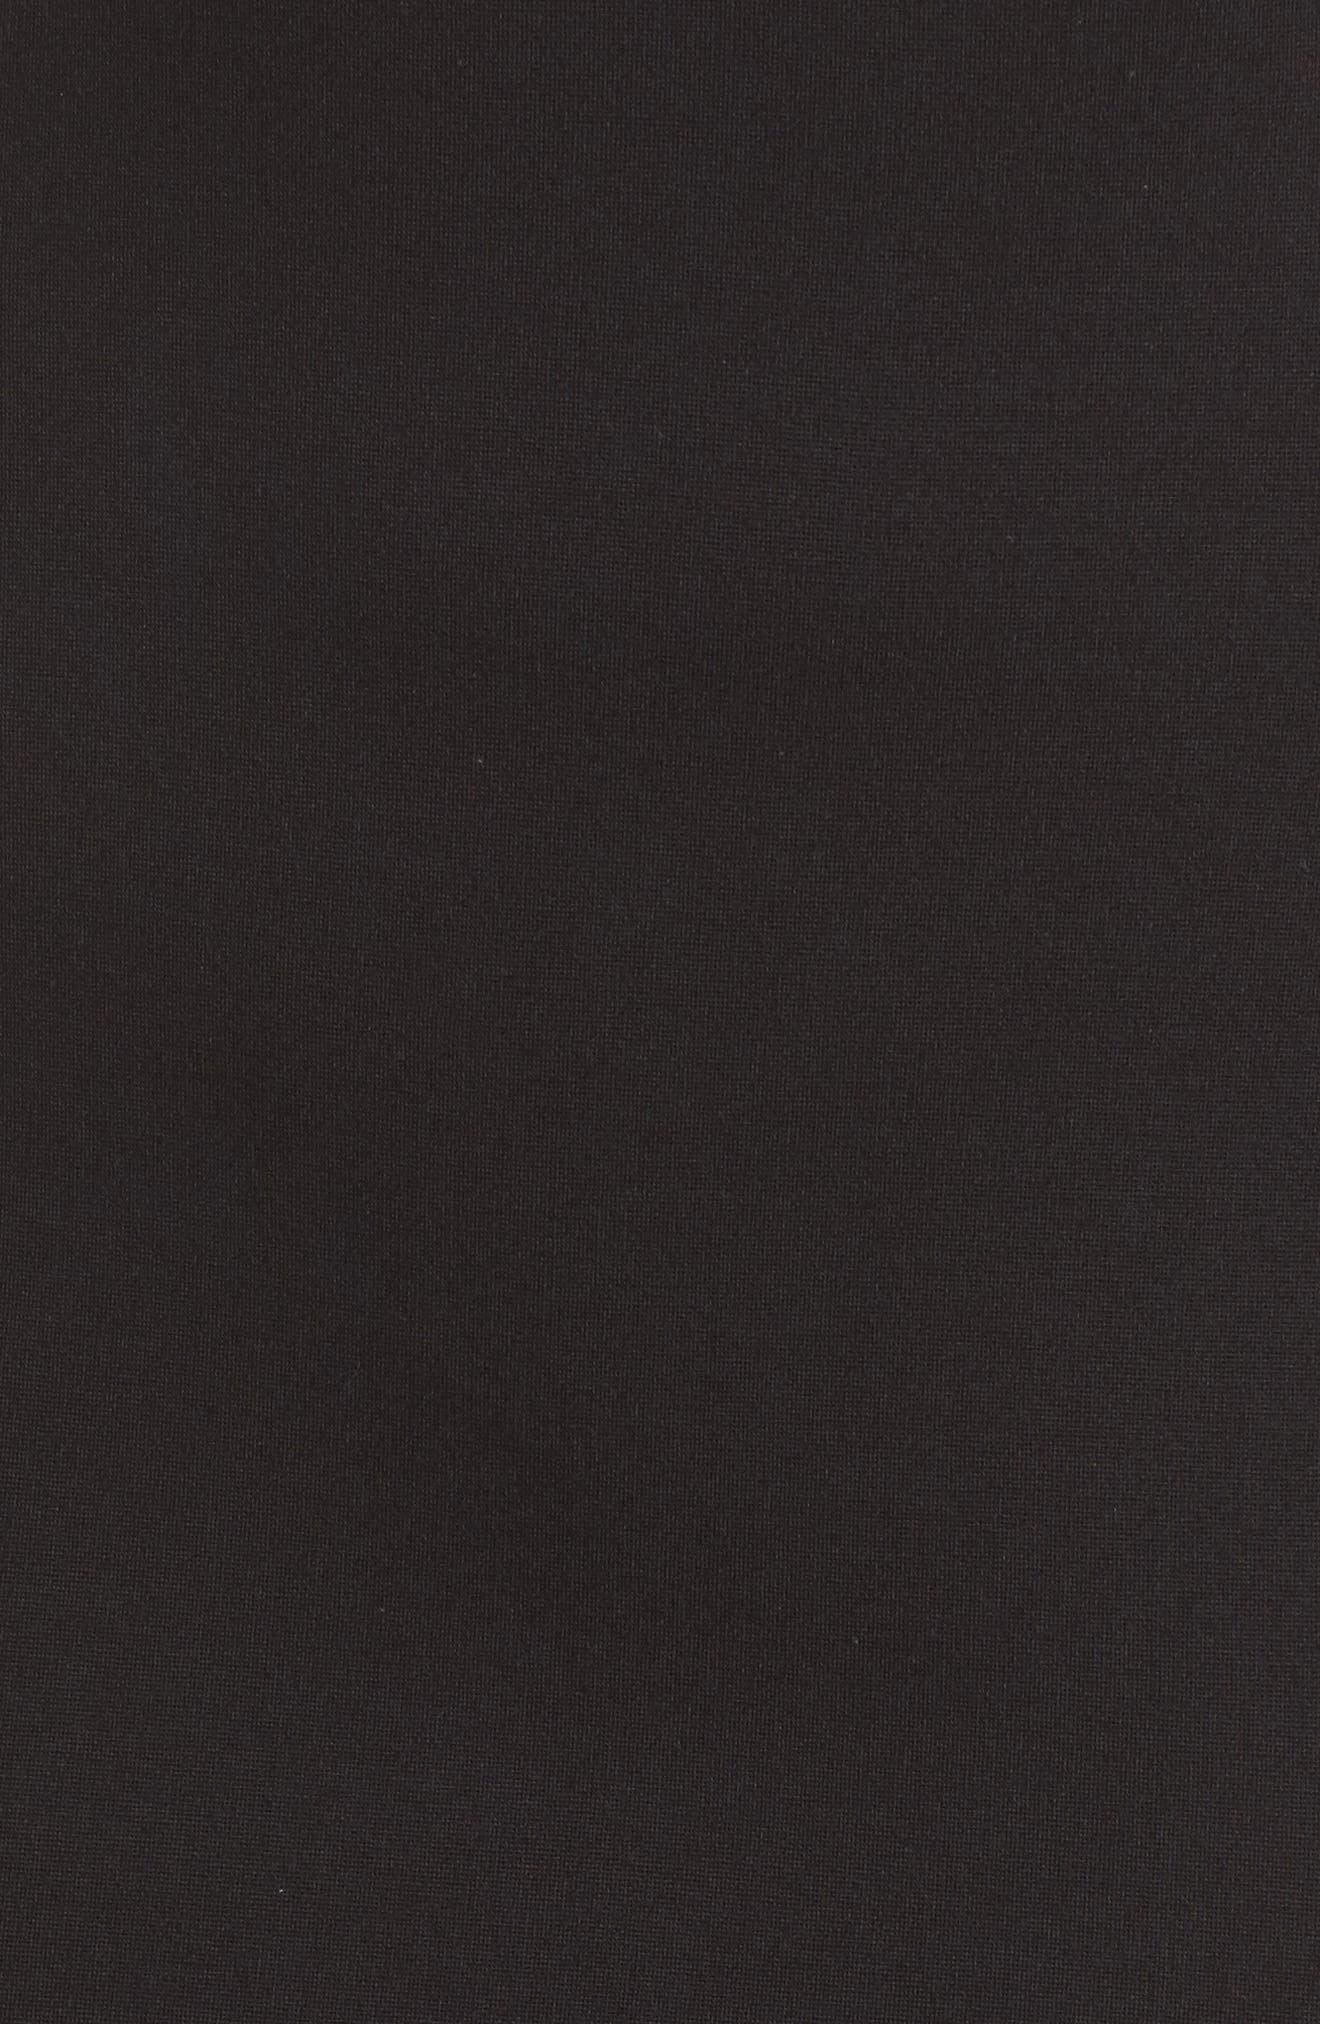 Lore Lula Colorblock Ponte Sheath Dress,                             Alternate thumbnail 5, color,                             Black/ Summer White